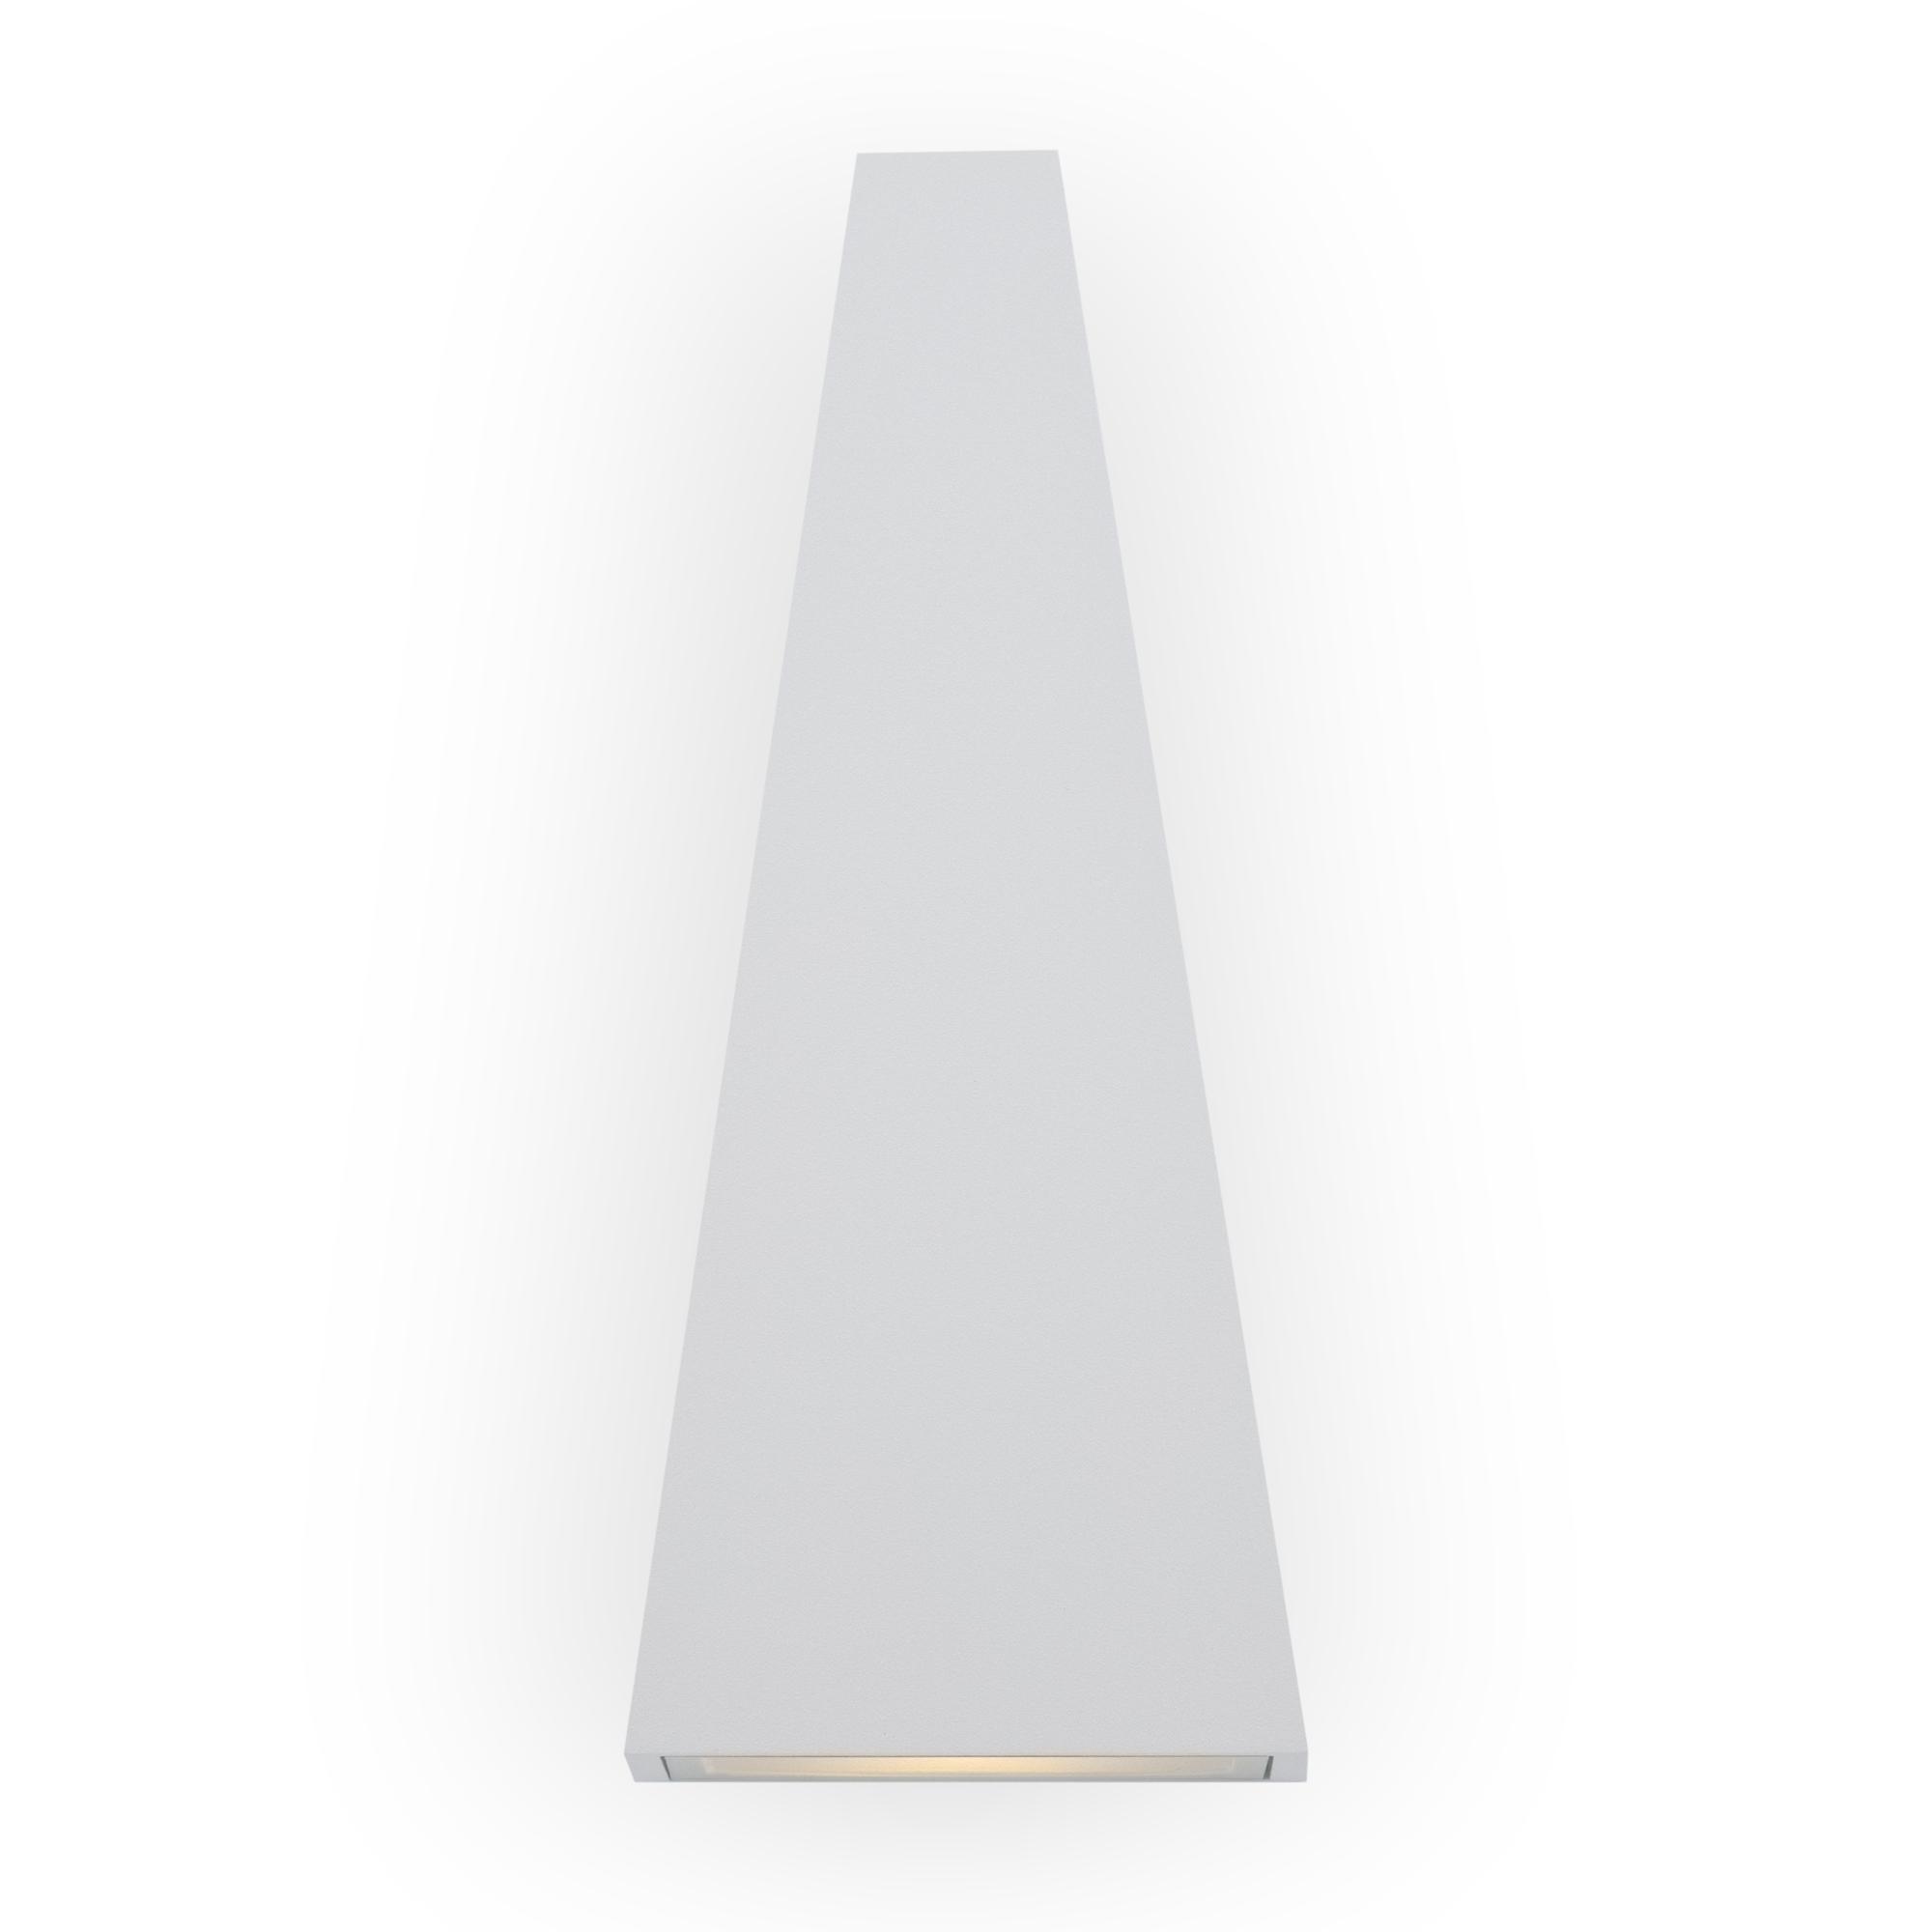 Настенный светодиодный светильник Maytoni Times Square O580WL-L6W, IP54, LED 6W 3000K 380lm CRI80, белый, металл - фото 3